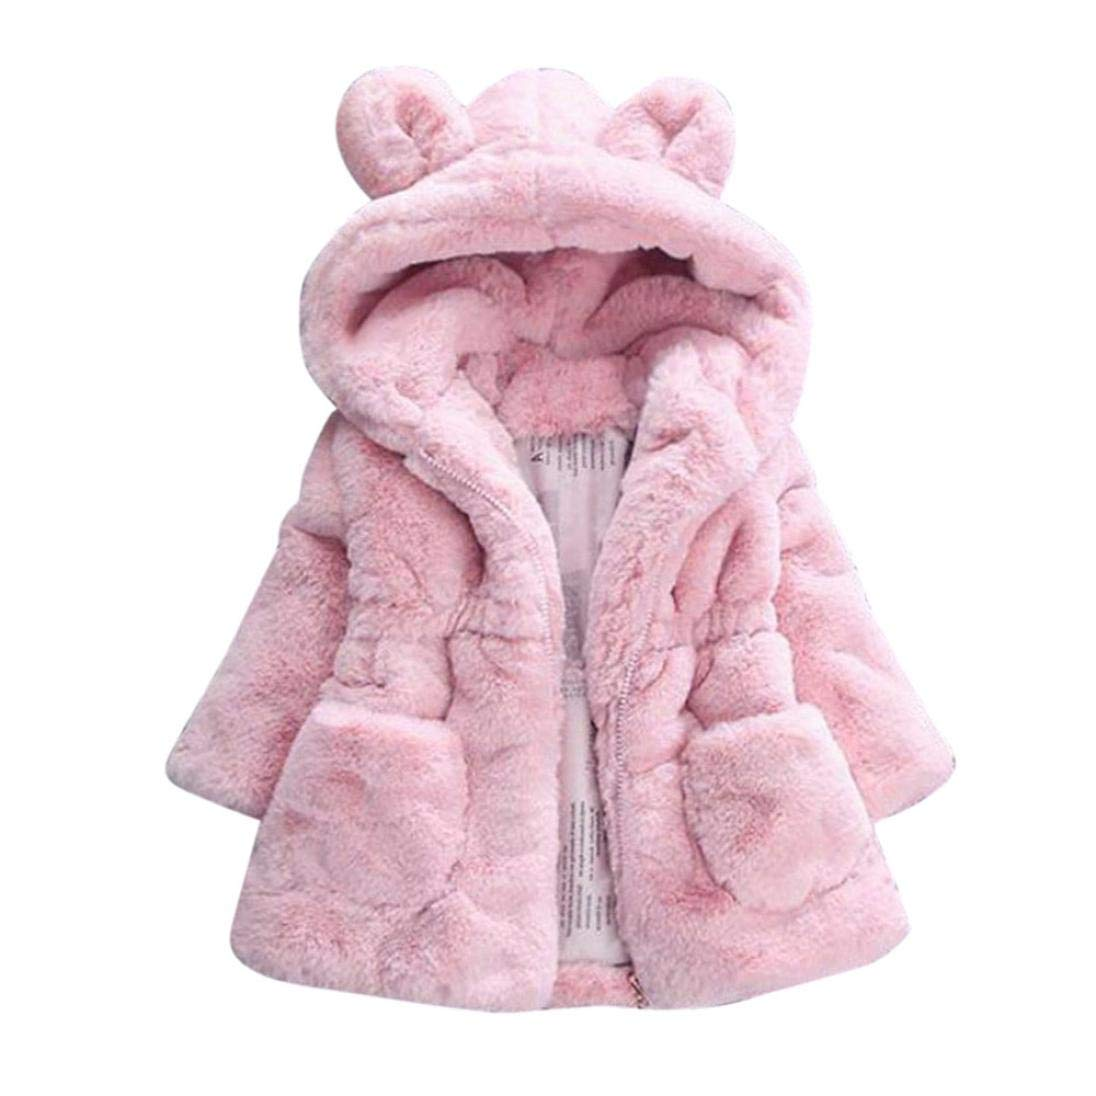 Winsummer Baby Boys Girls Toddler Kids Fall Winter Fleece Thick Down Coat Jacket Outerwear Faux Fur Hoodies Jackets (Pink, 4T)